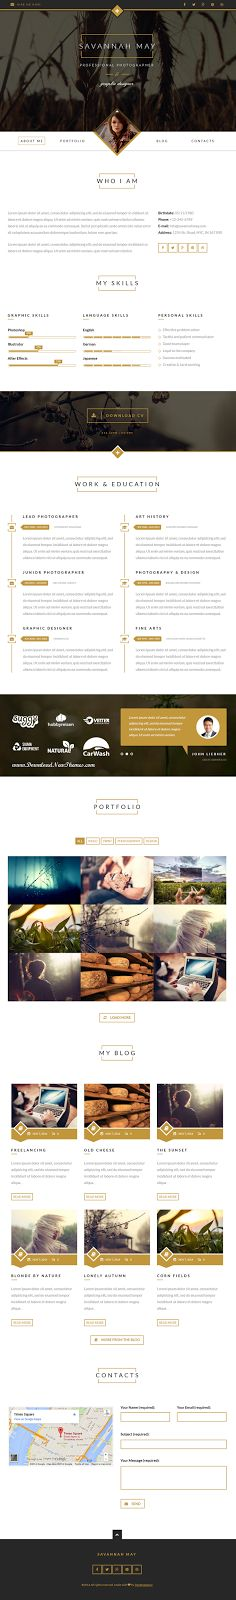 Best Responsive WordPress vCard Portfolio Template Ici j'aime le menu ( cf ancien portfolio)